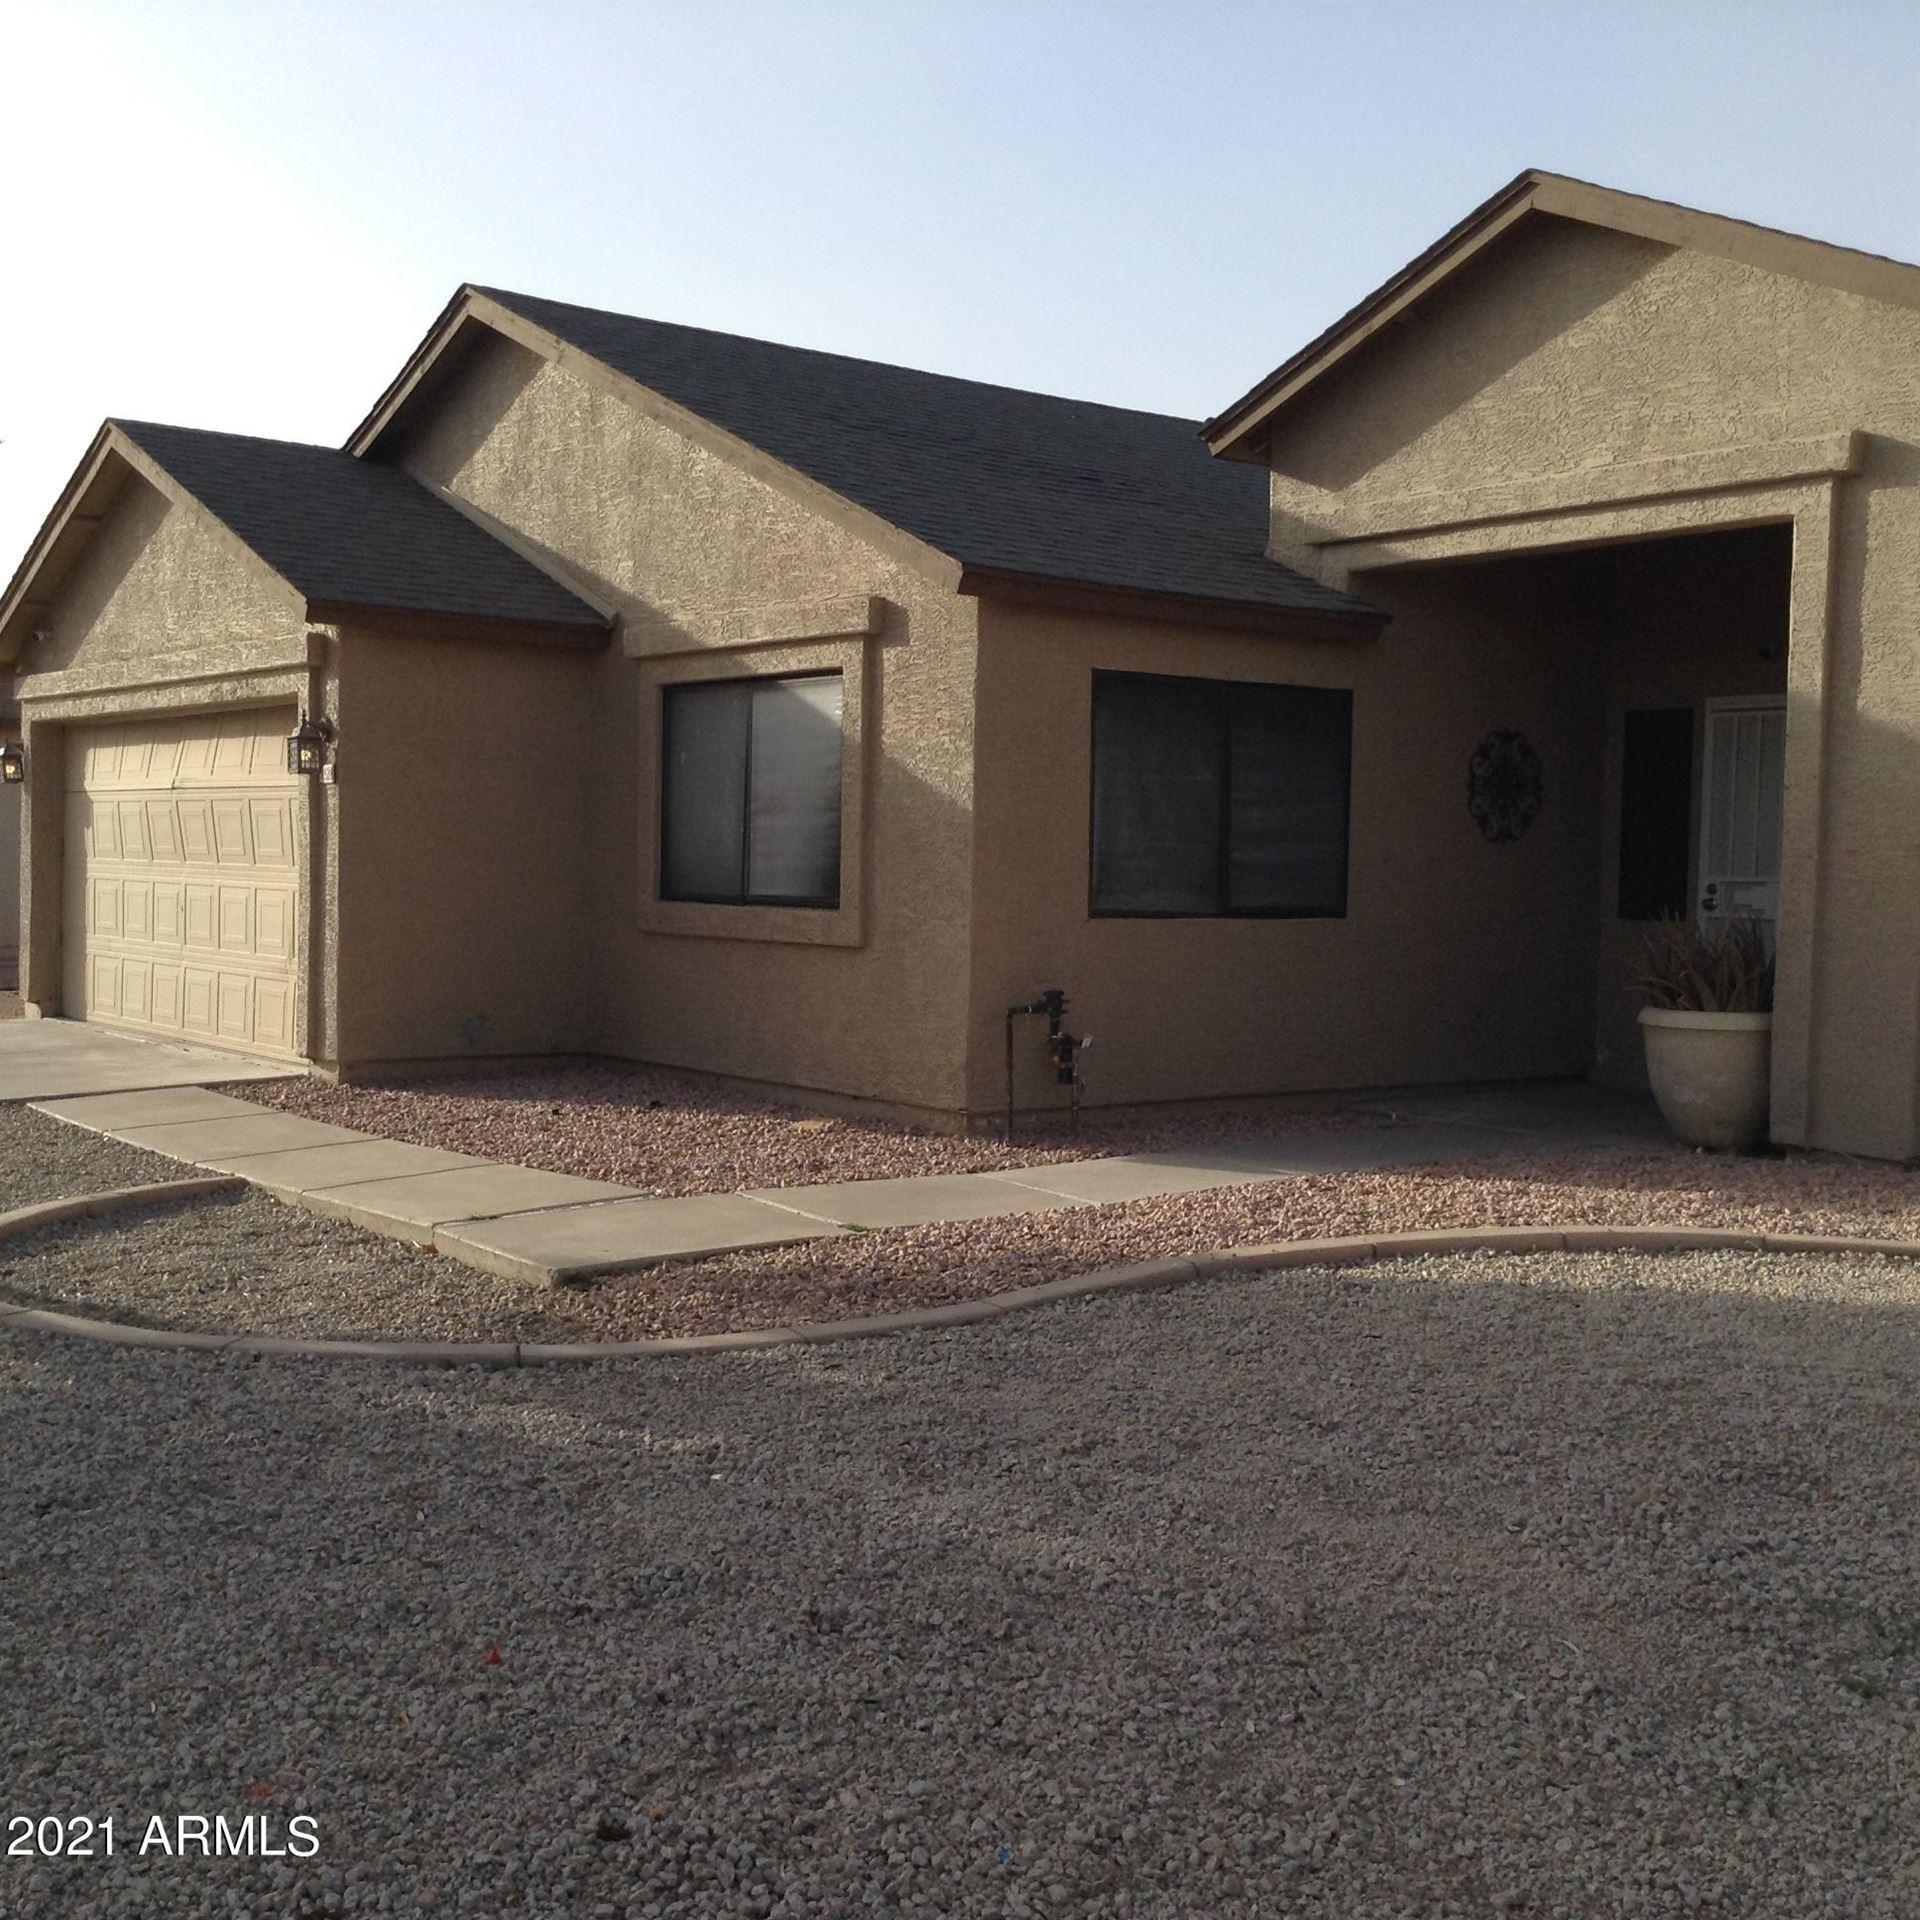 Photo of 8528 W COLLEGE Drive #1, Phoenix, AZ 85037 (MLS # 6202738)